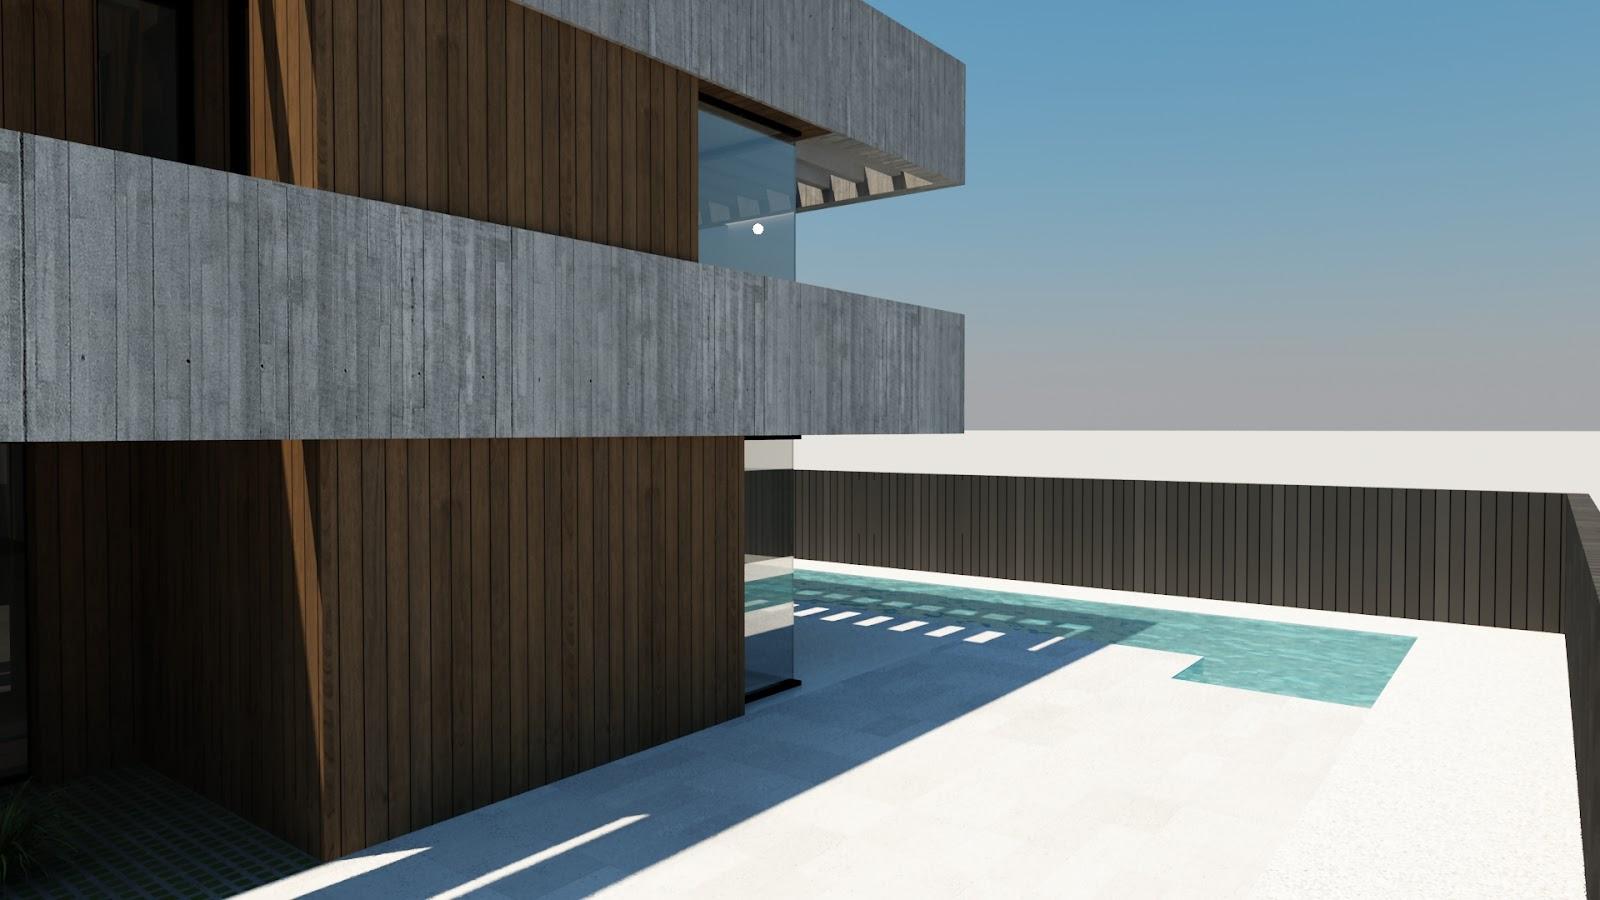 Ruben muedra estudio de arquitectura valencia for Estudios arquitectura zaragoza